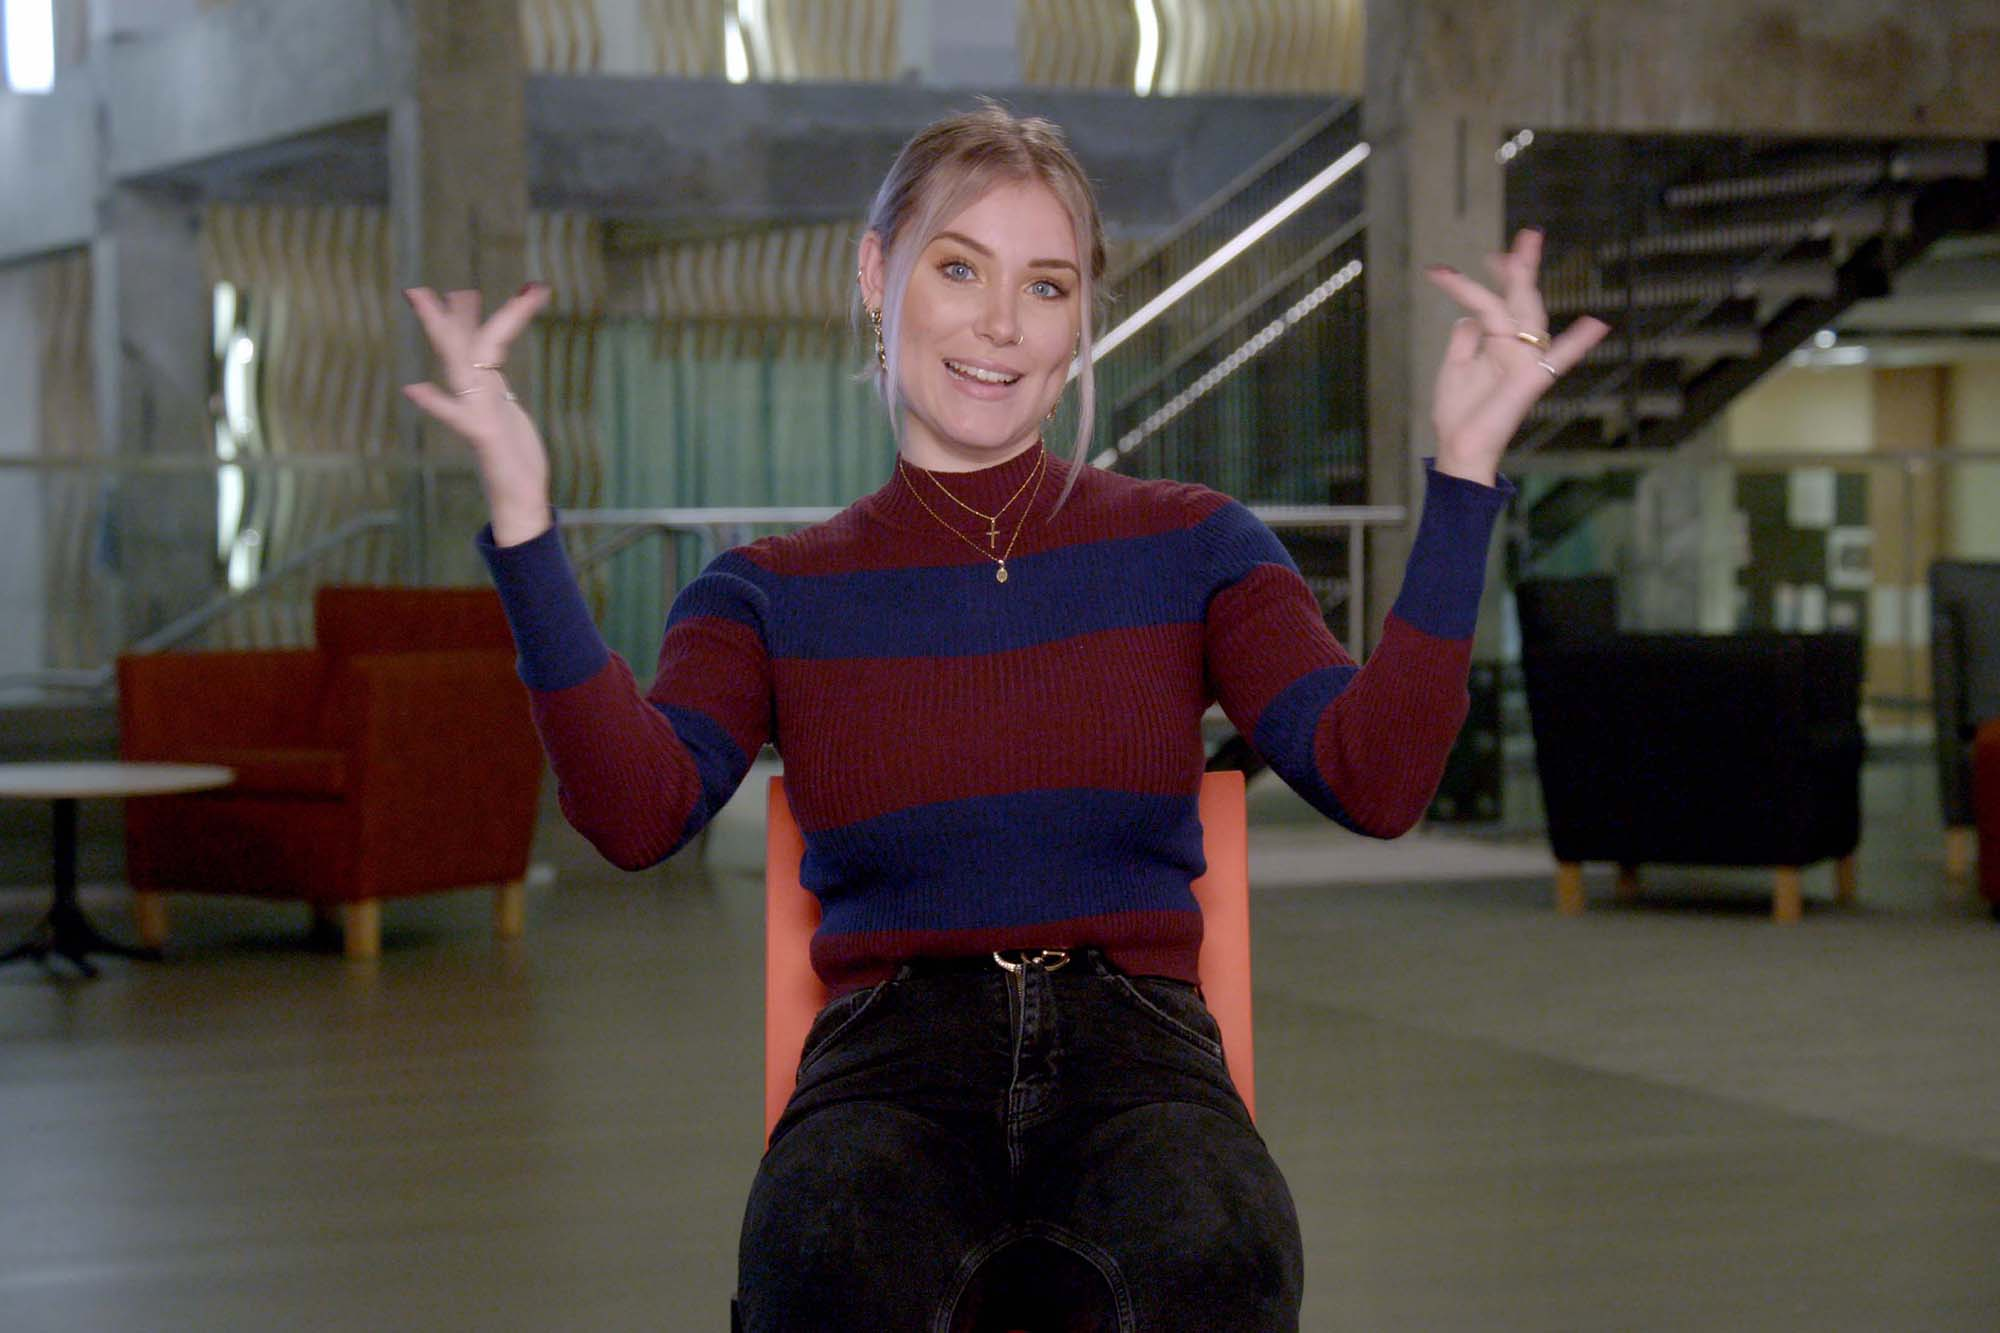 Deaf college students shine in Netflix's new series 'Deaf U'